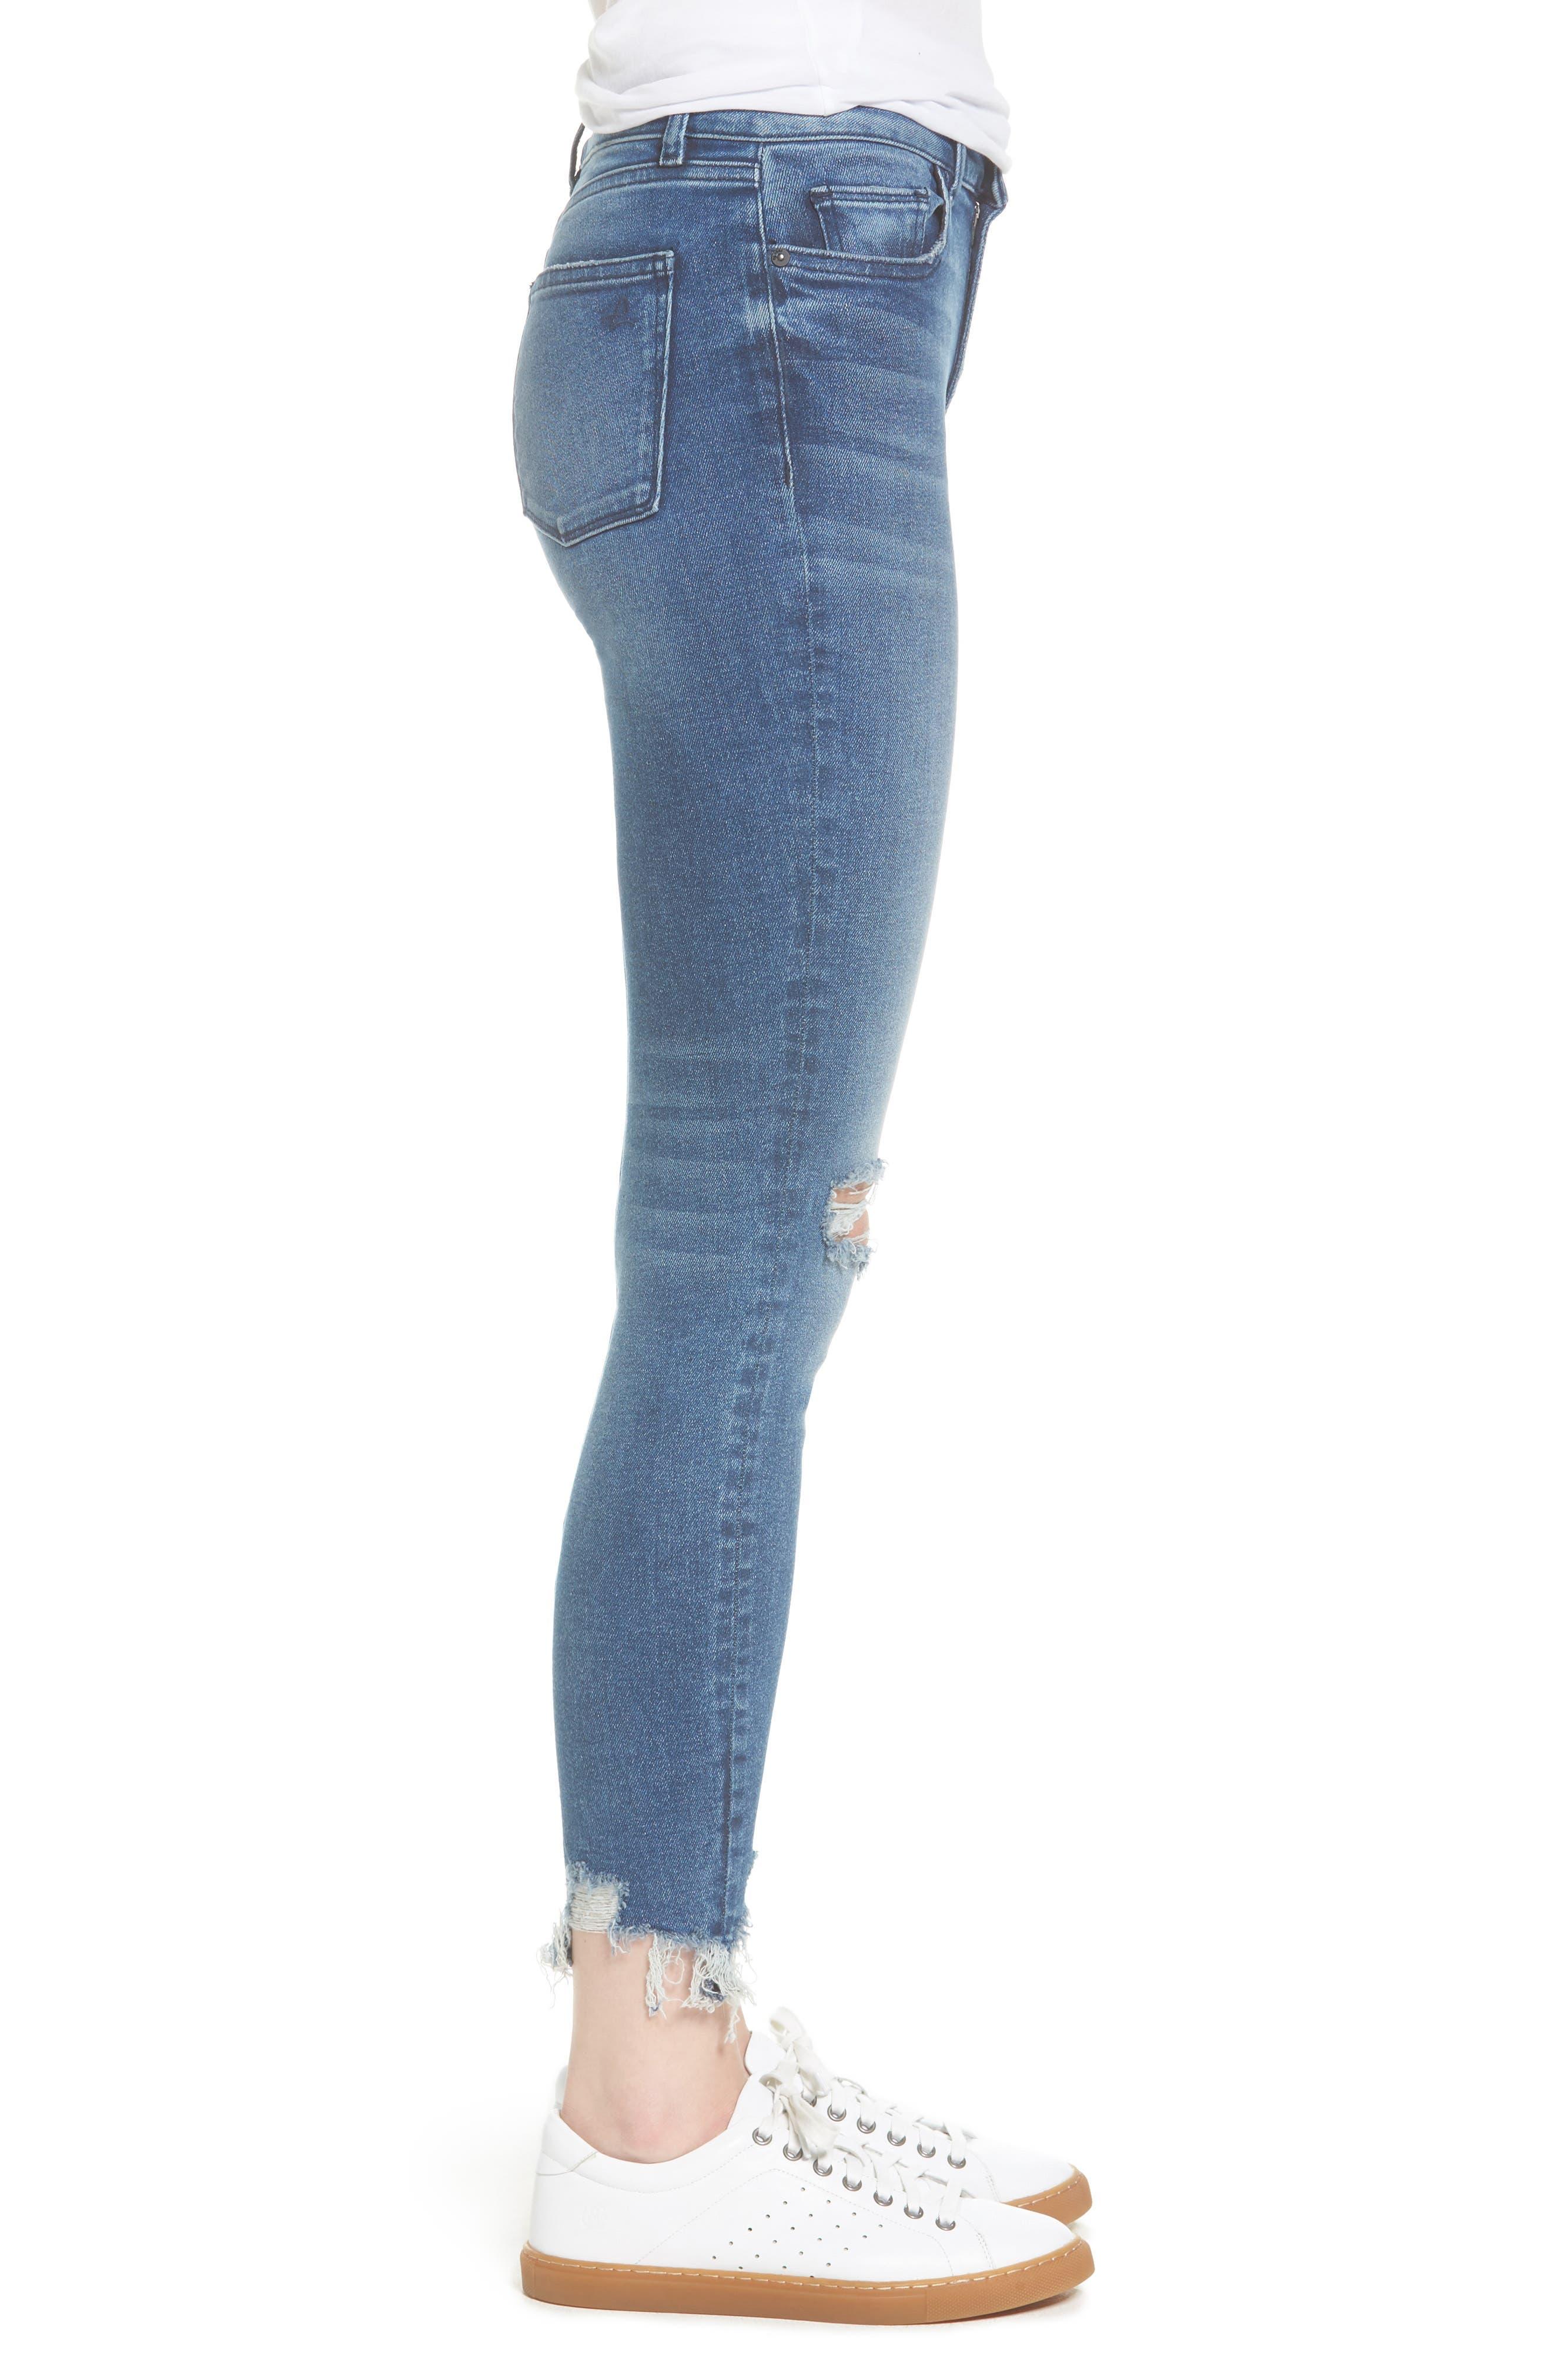 Alternate Image 3  - DL1961 Farrow Instaslim High Waist Ankle Skinny Jeans (Laramie)